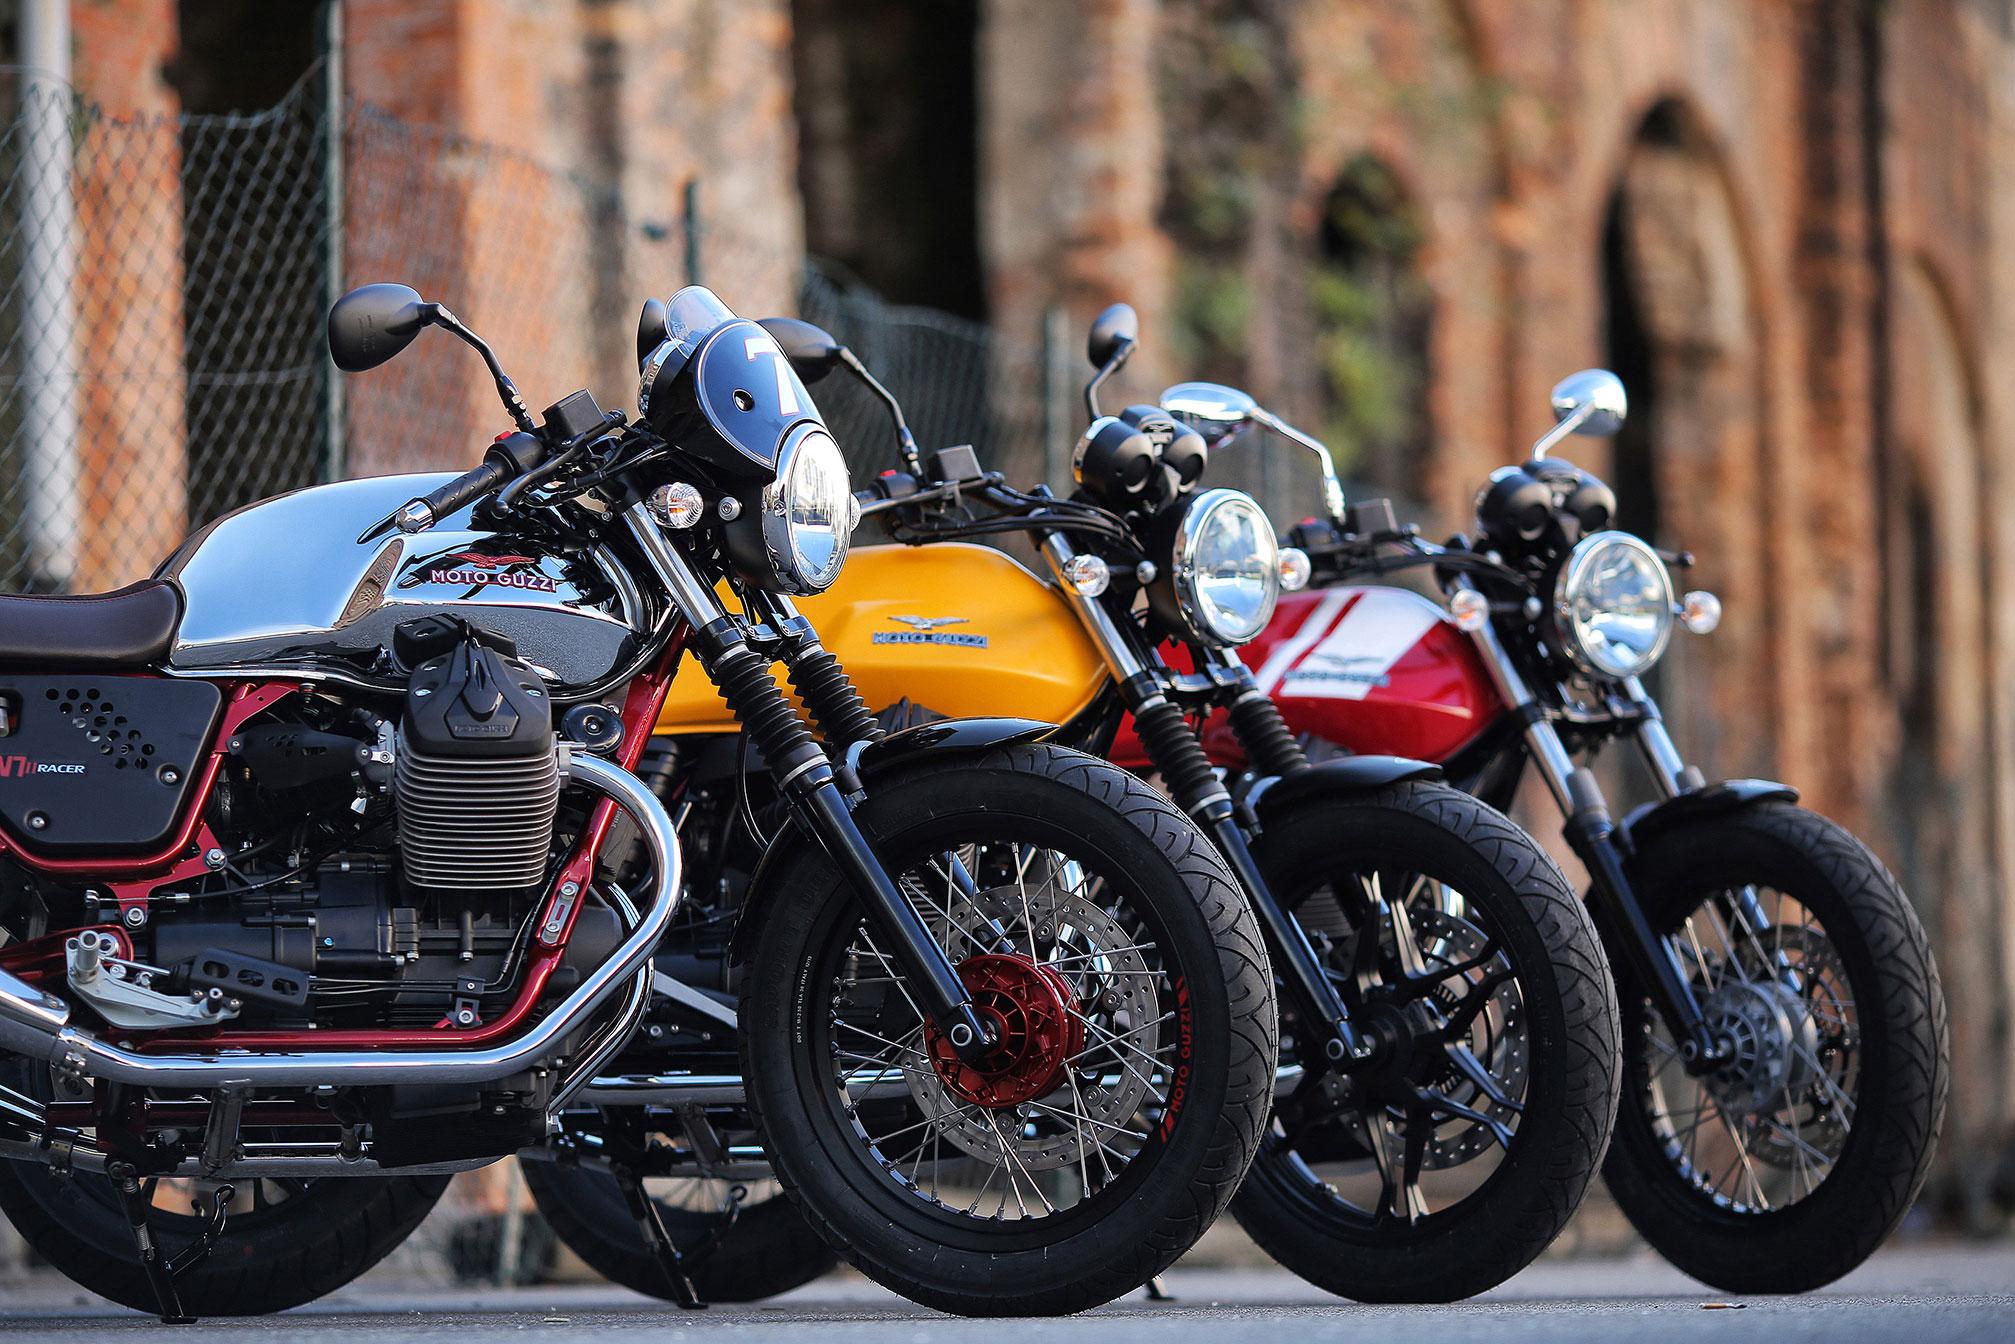 2020 Moto Guzzi V7 III Rough Guide • Total Motorcycle